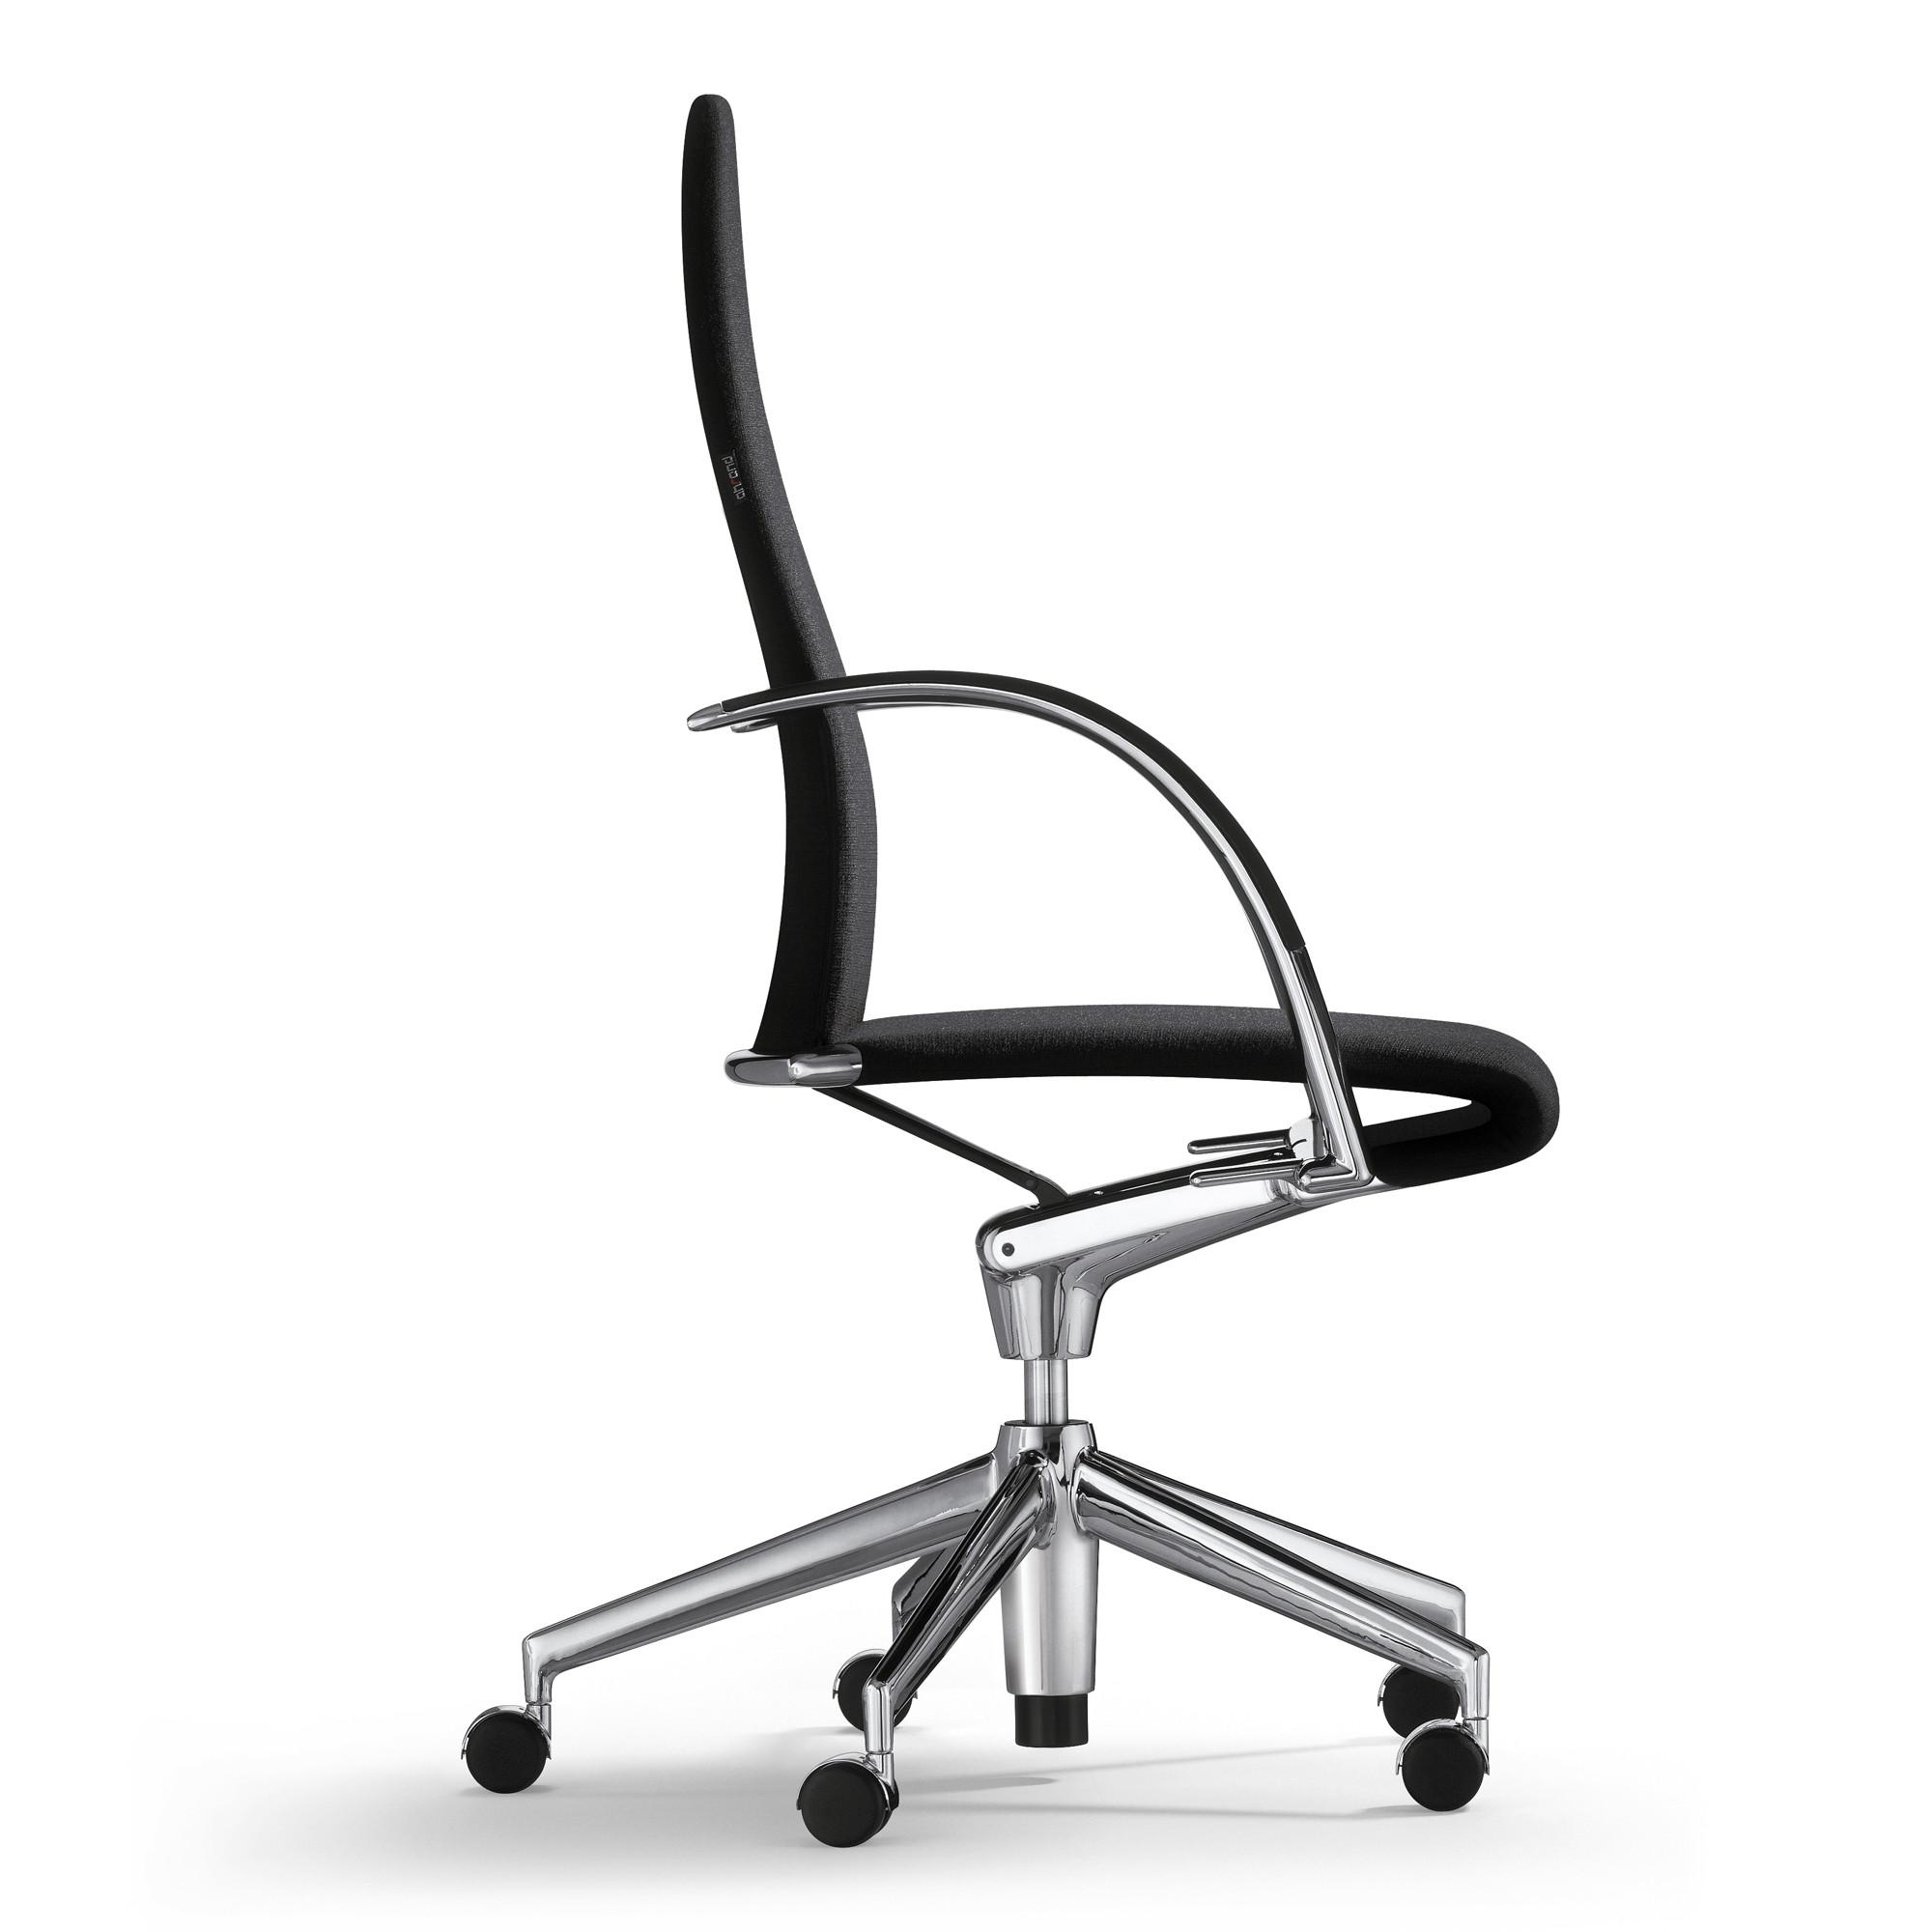 Ahrend 350 Ergonomic Office Chairs